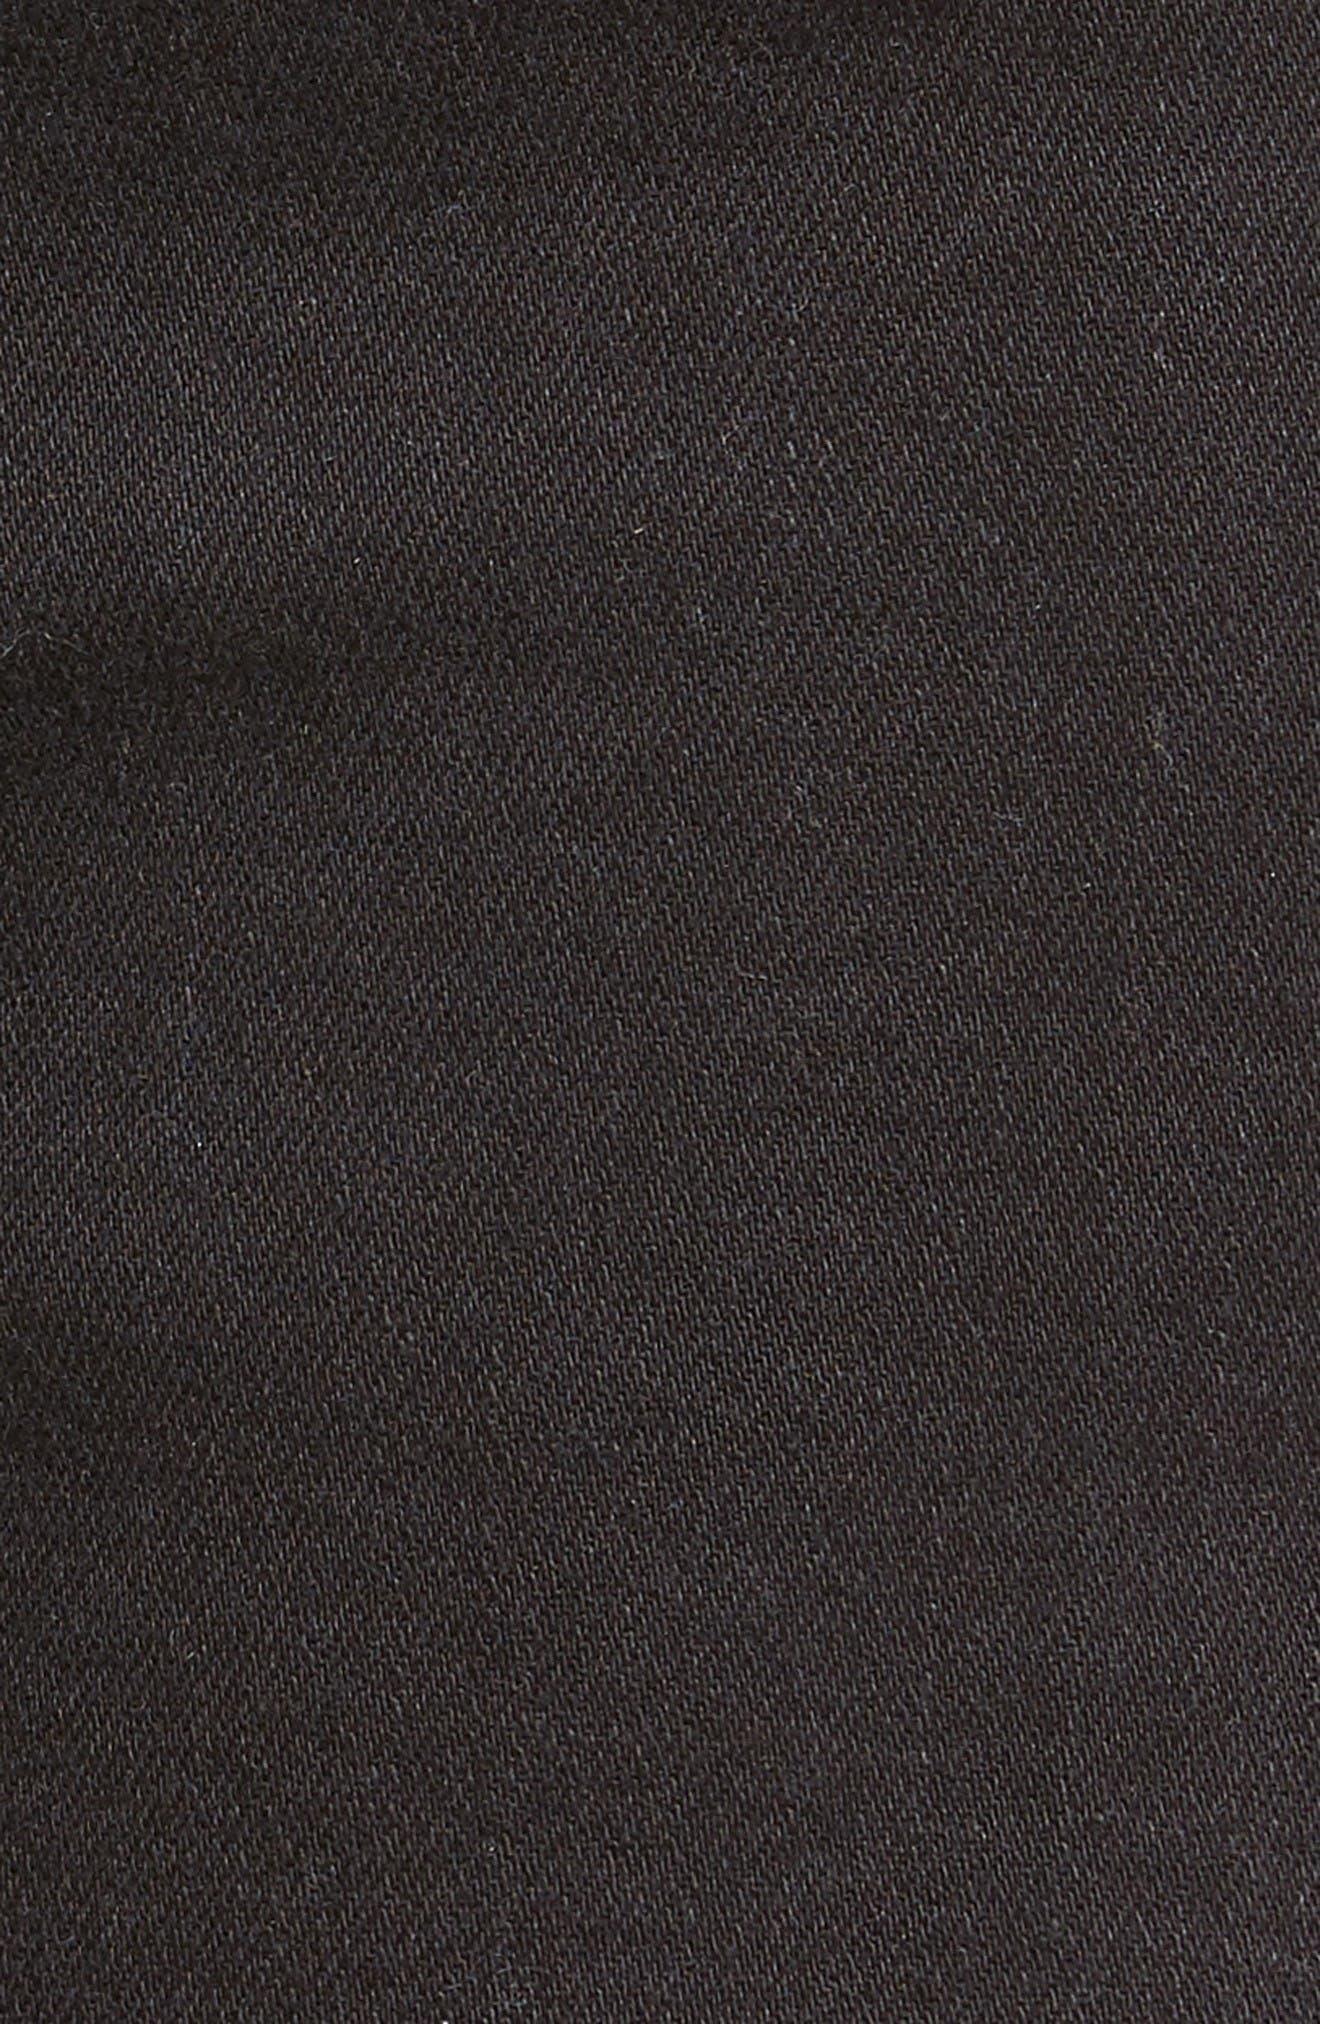 Alternate Image 5  - PAIGE Margot High Waist Cutoff Denim Shorts (Noir Studded Heart)